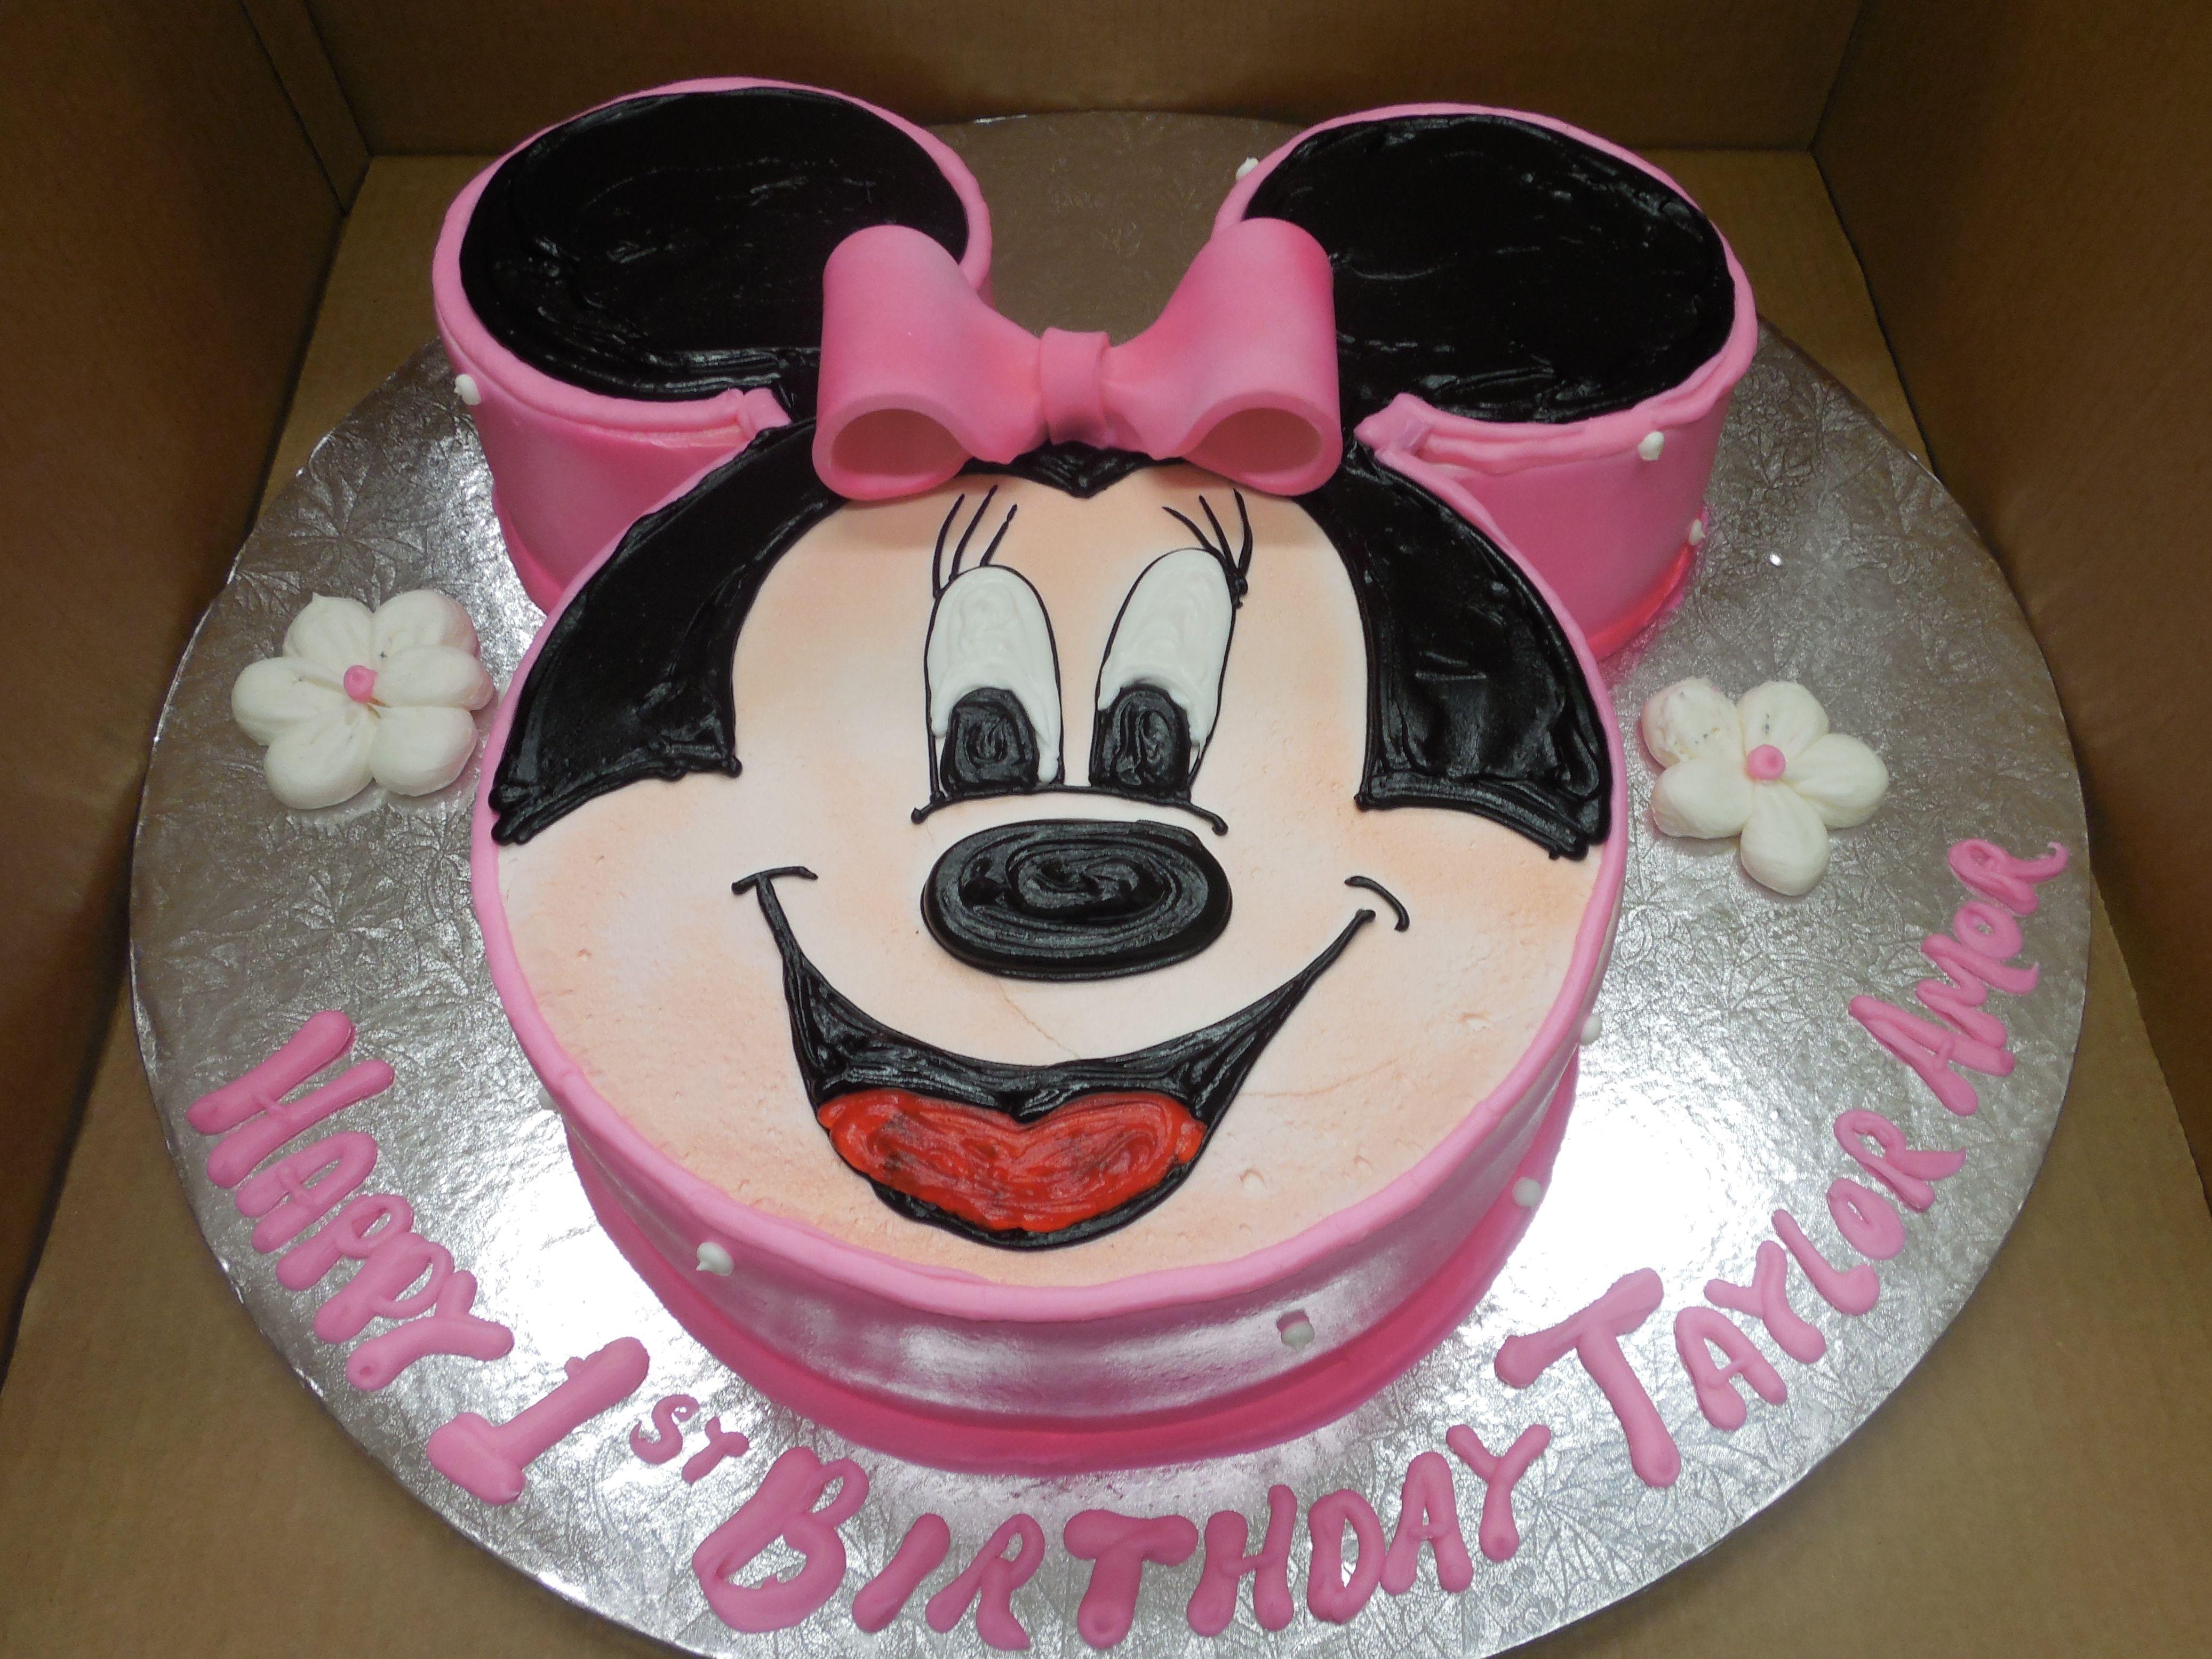 Calumet Bakery Minnie Mouse Face Cake 1st birthday cakes